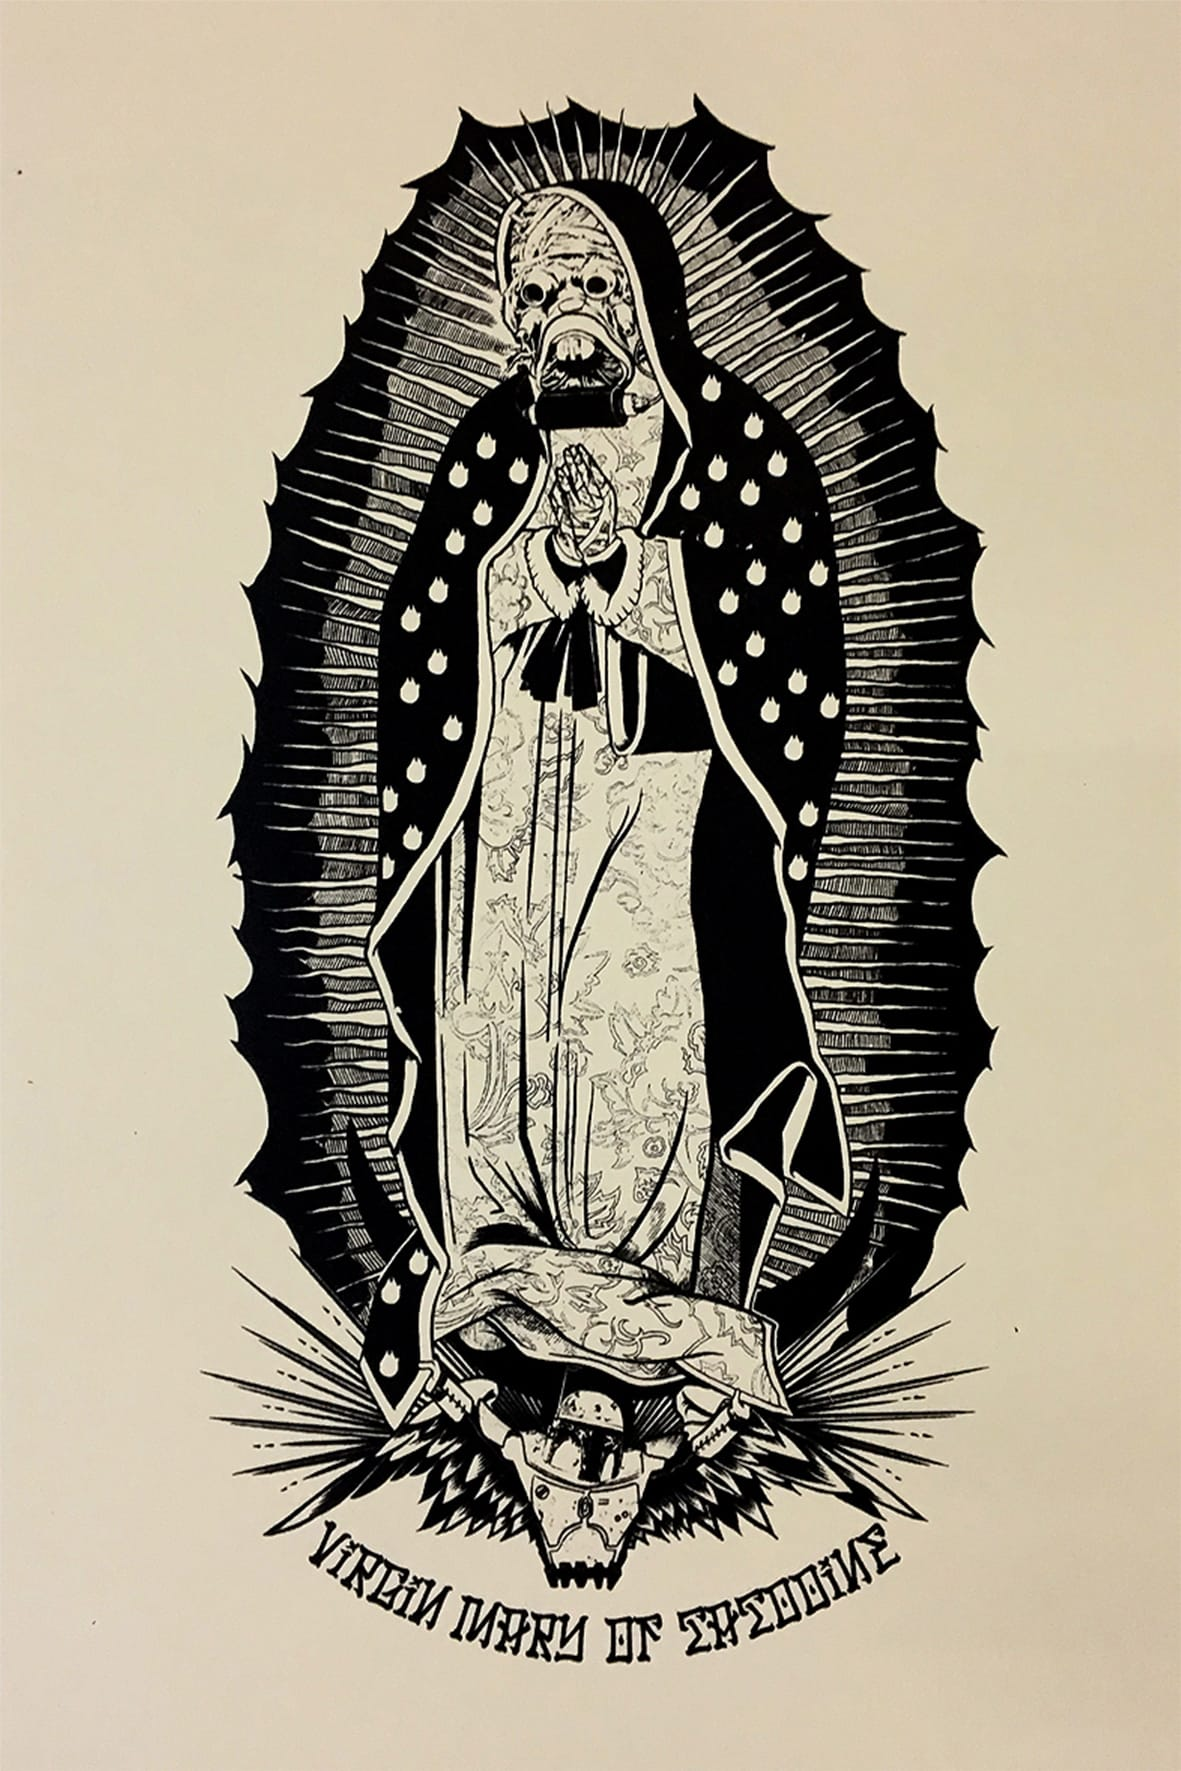 Virgin Mary of Tatooine - Artprint